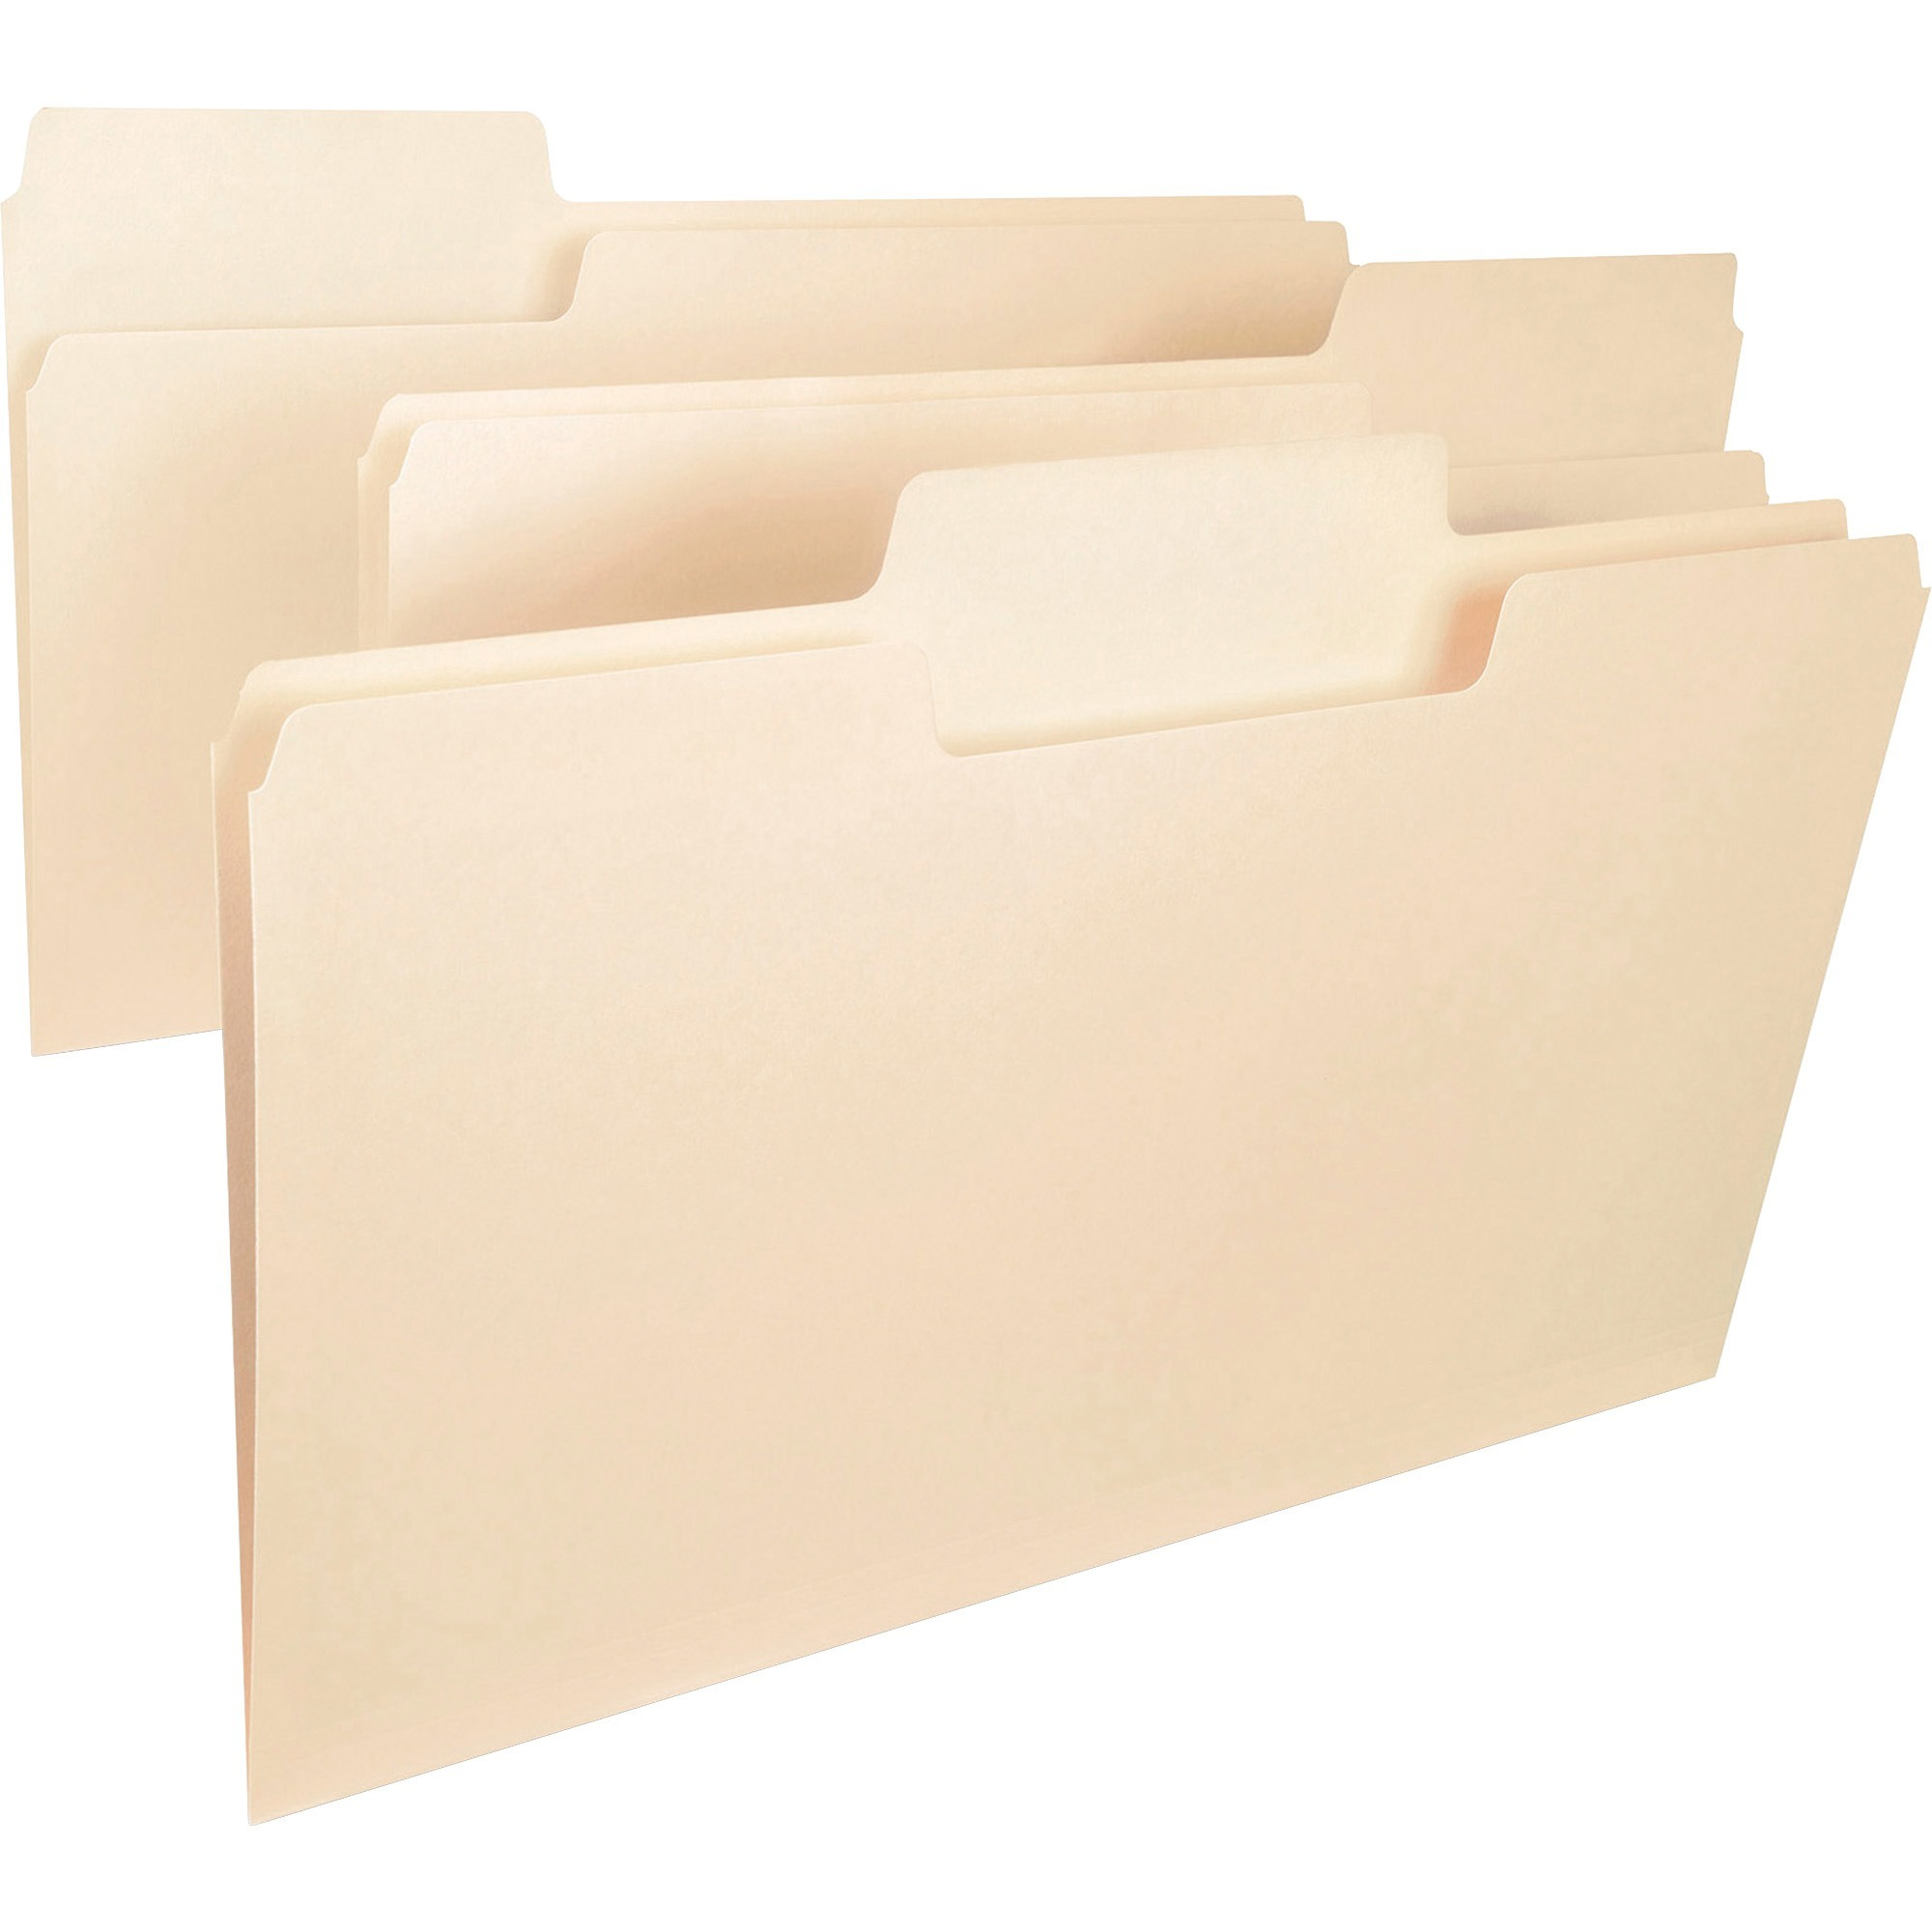 Smead SuperTab® Heavyweight File Folder, Oversized 1/3-Cut Tab, Legal Size, Manila, 50 Per Box (15401)